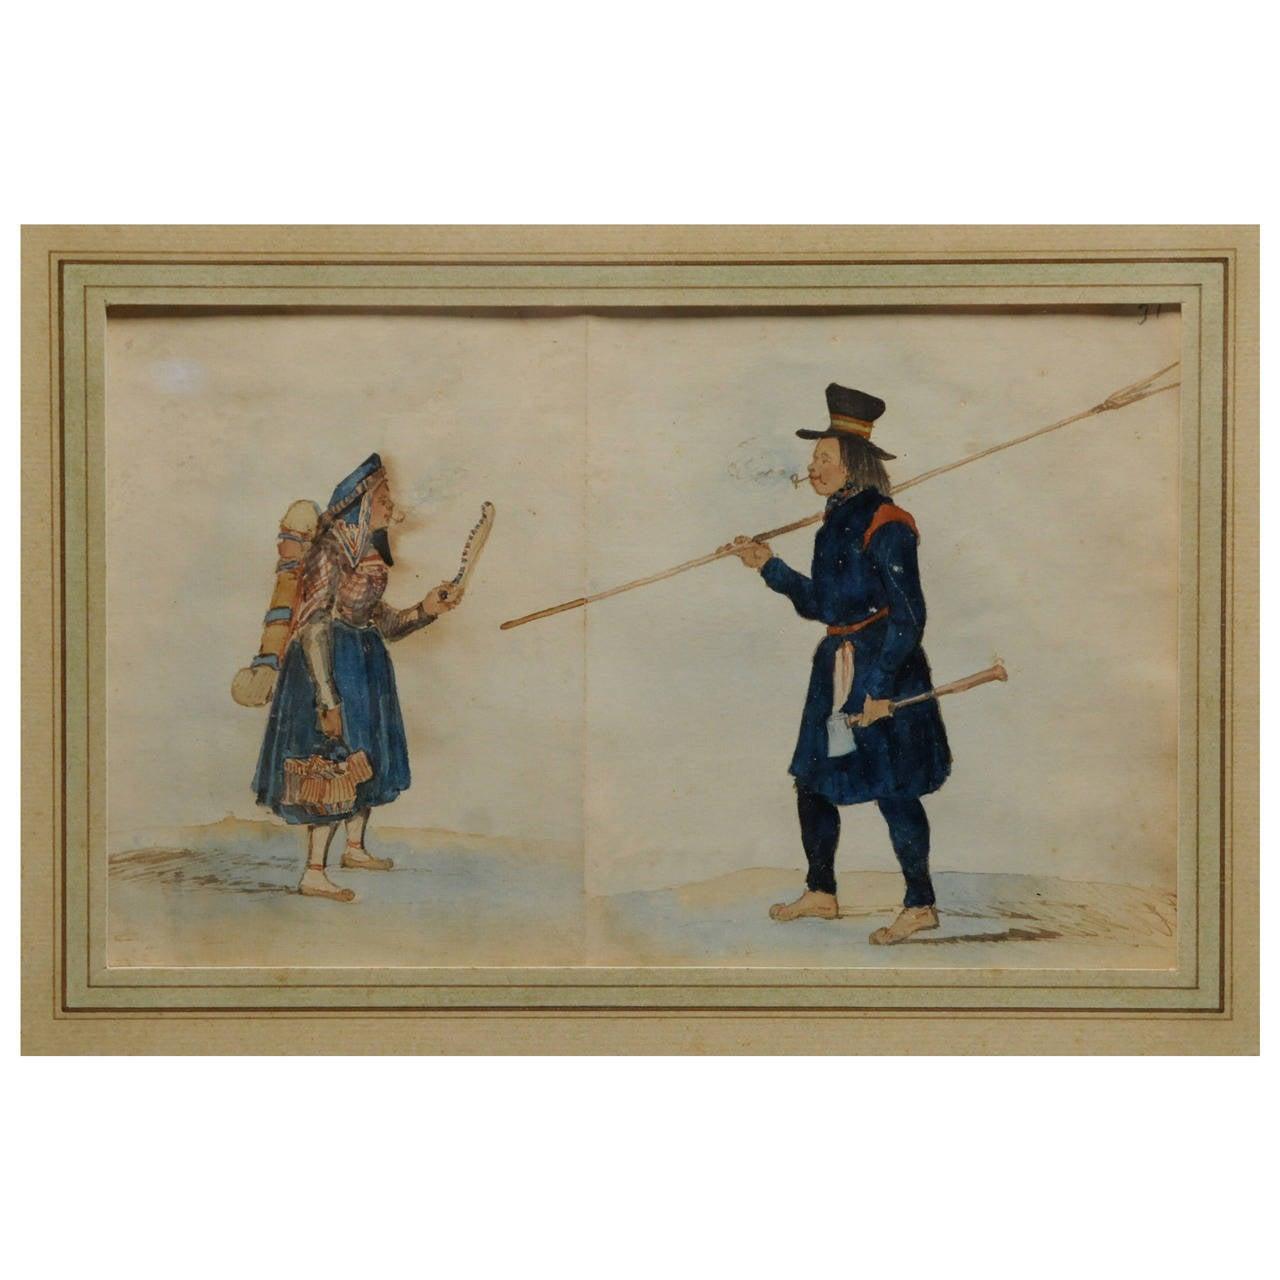 Antique Native American Watercolor, 19th Century